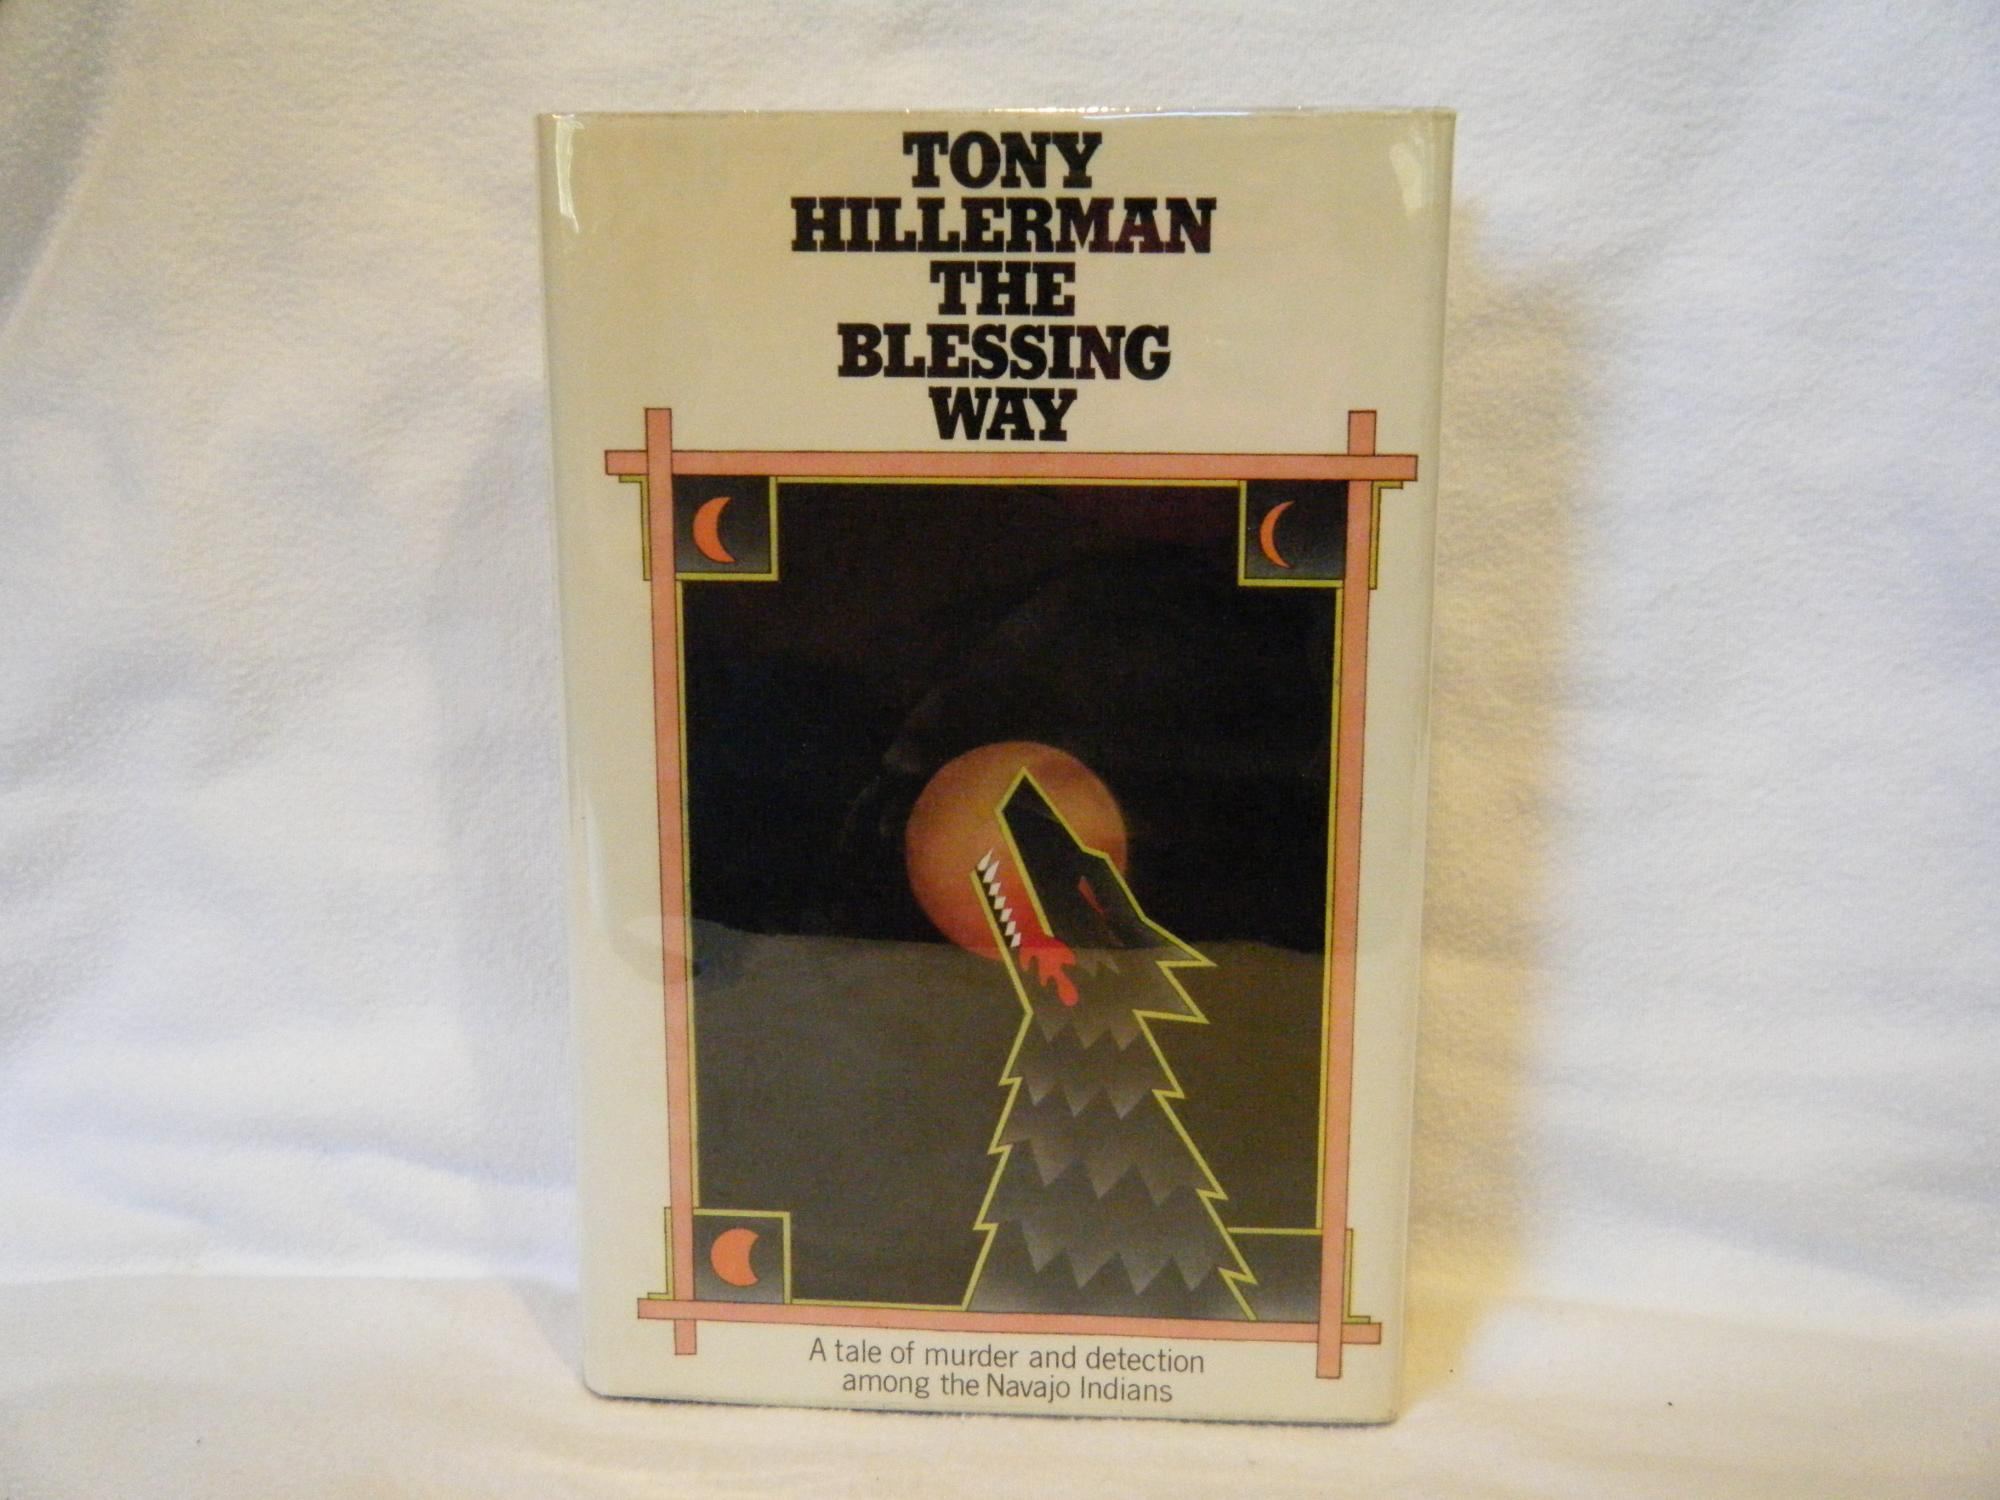 The_Blessing_Way_Hillerman_Tony_Bon_Couverture_rigide